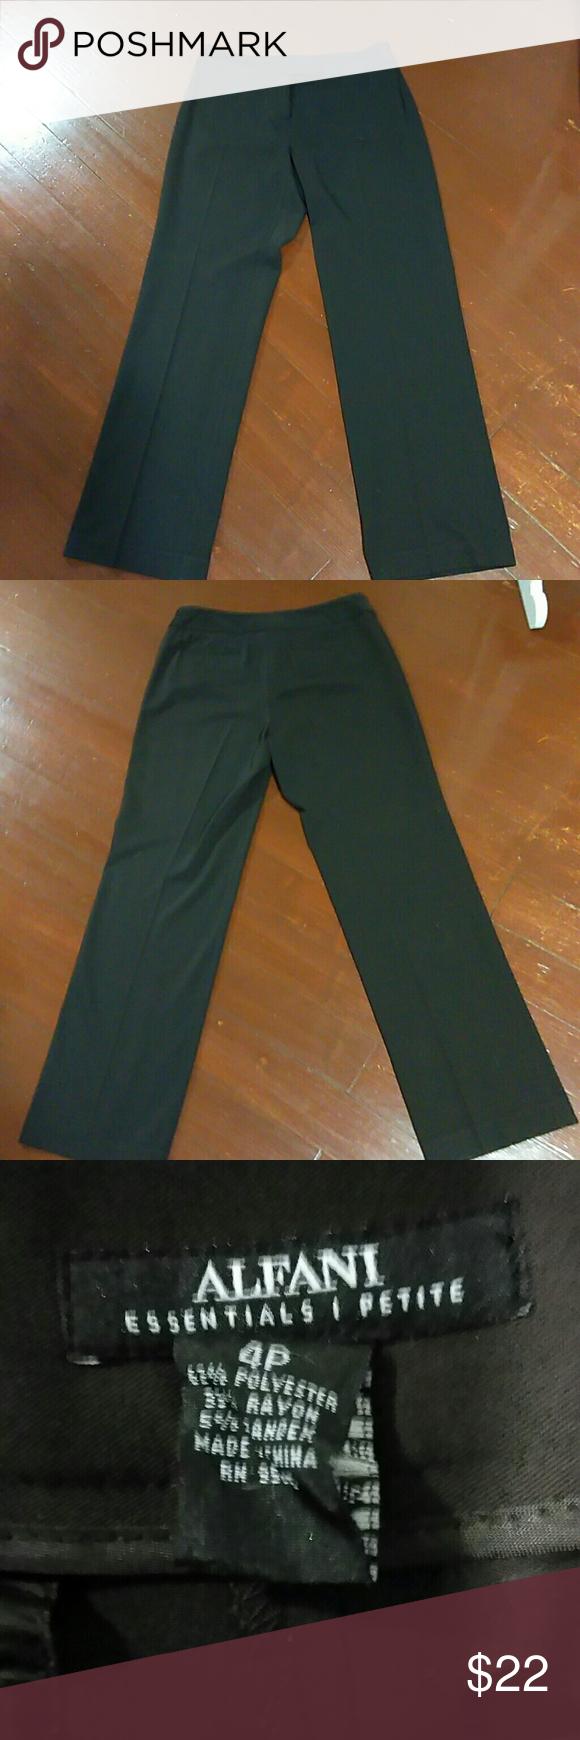 Alfani essentials petite p dark brown dress pants dress pants